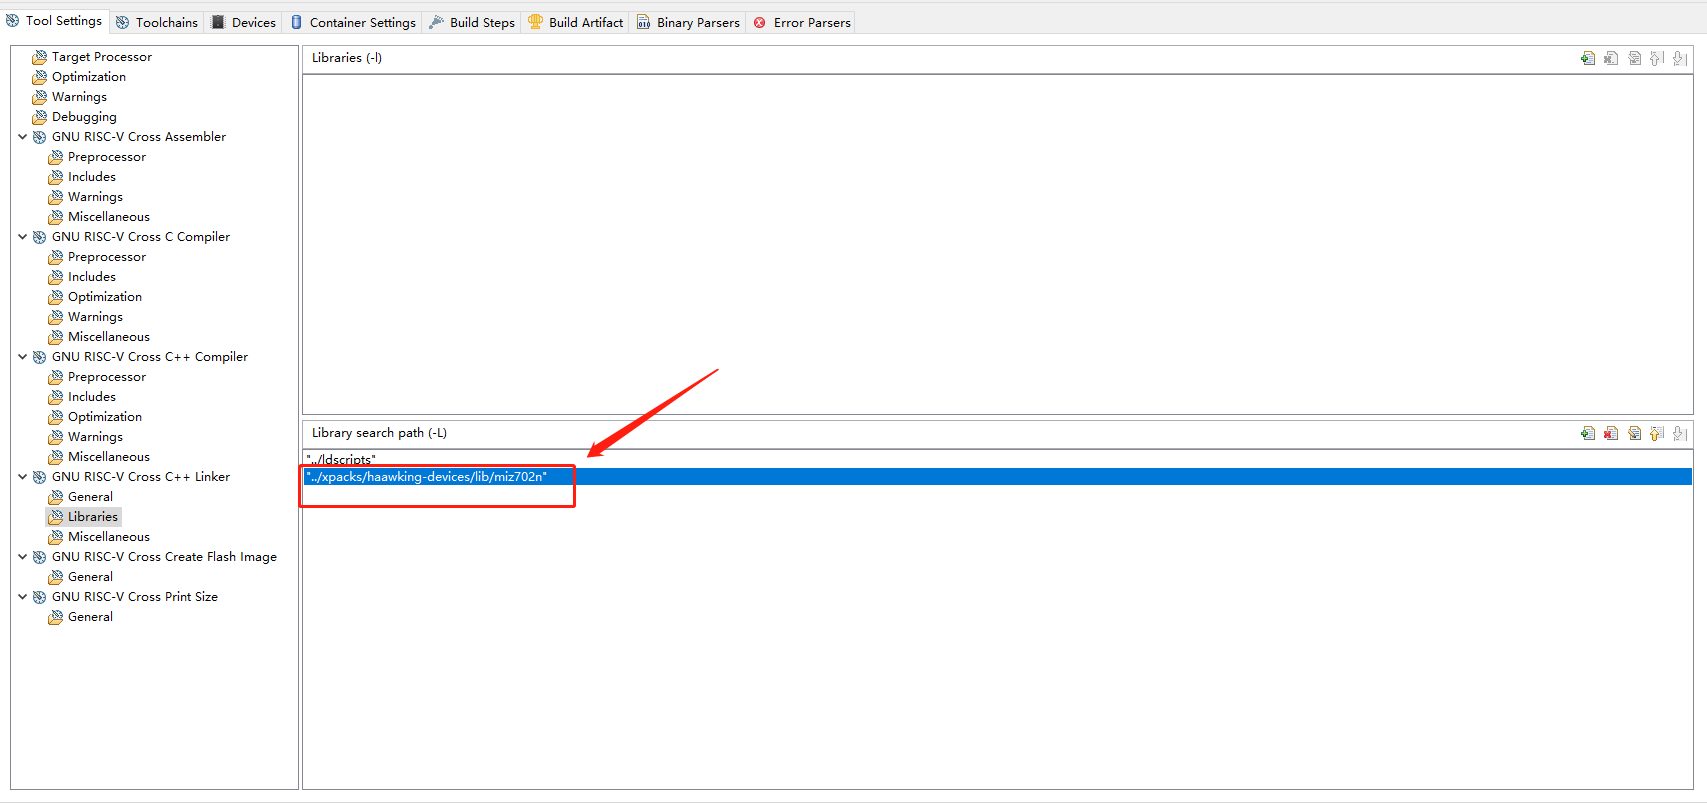 Adding Custom Command Line